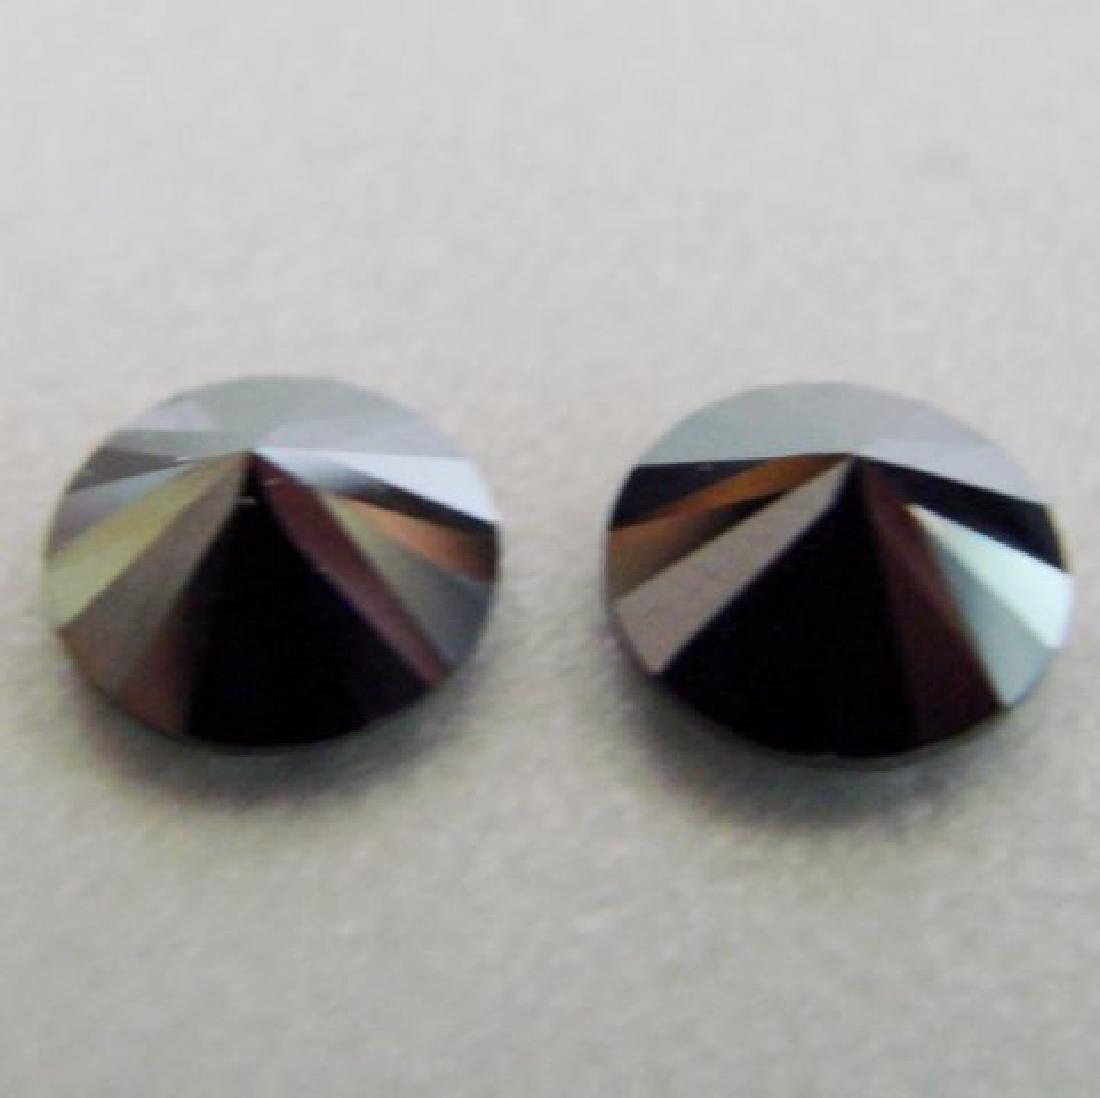 Natural Black Diamond Roud Shape Pairs 4.20Ct 8.8x4.5mm - 2